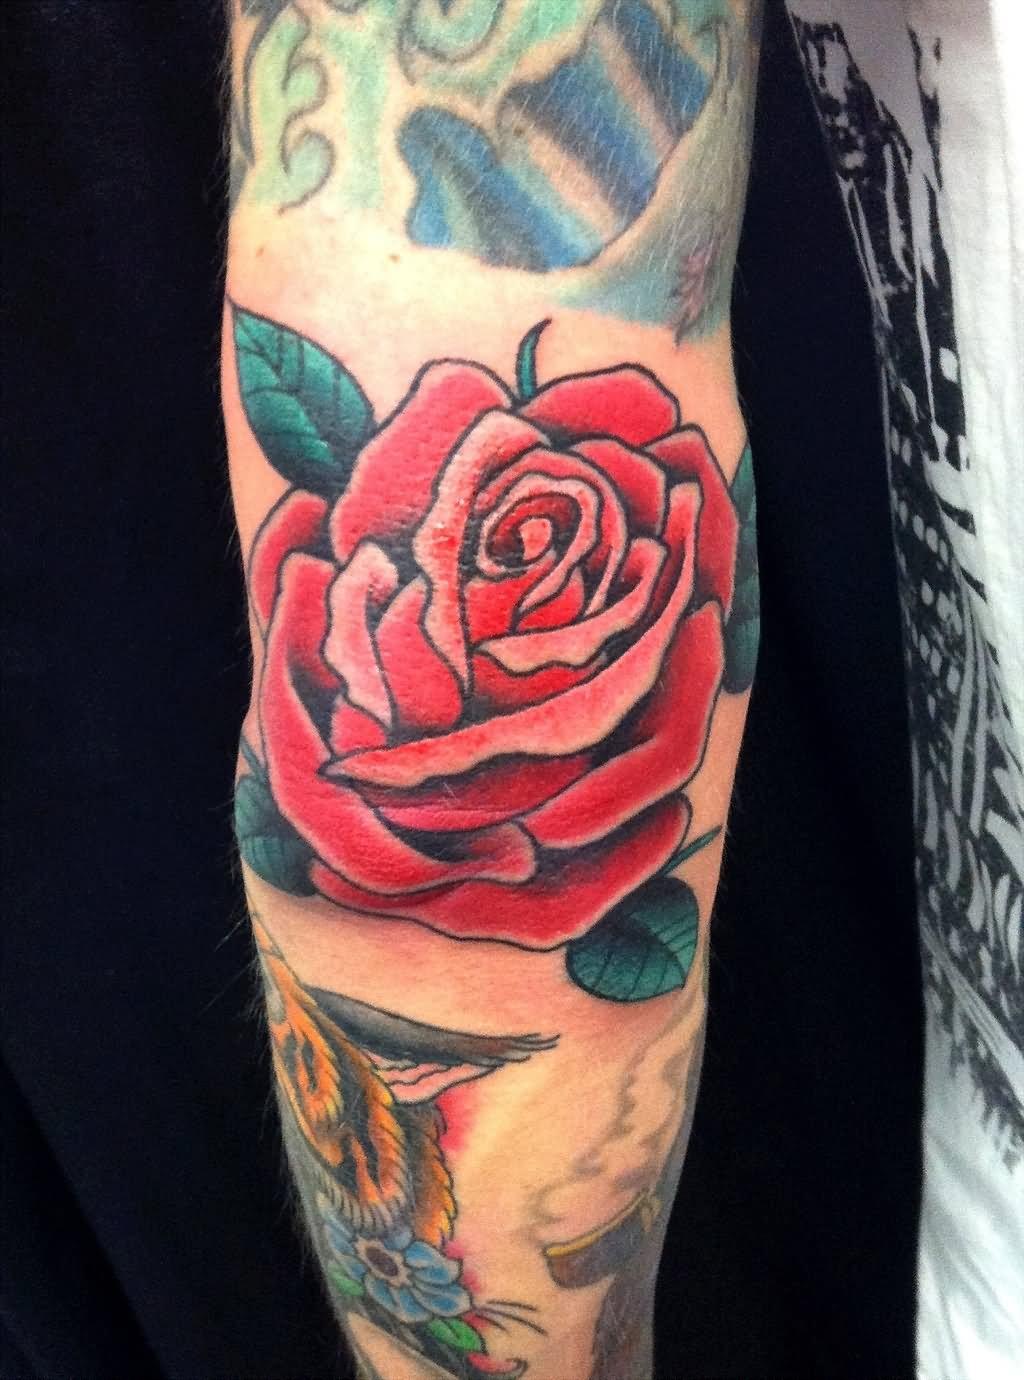 22 beautiful rose elbow tattoos red rose tattoo design for elbow izmirmasajfo